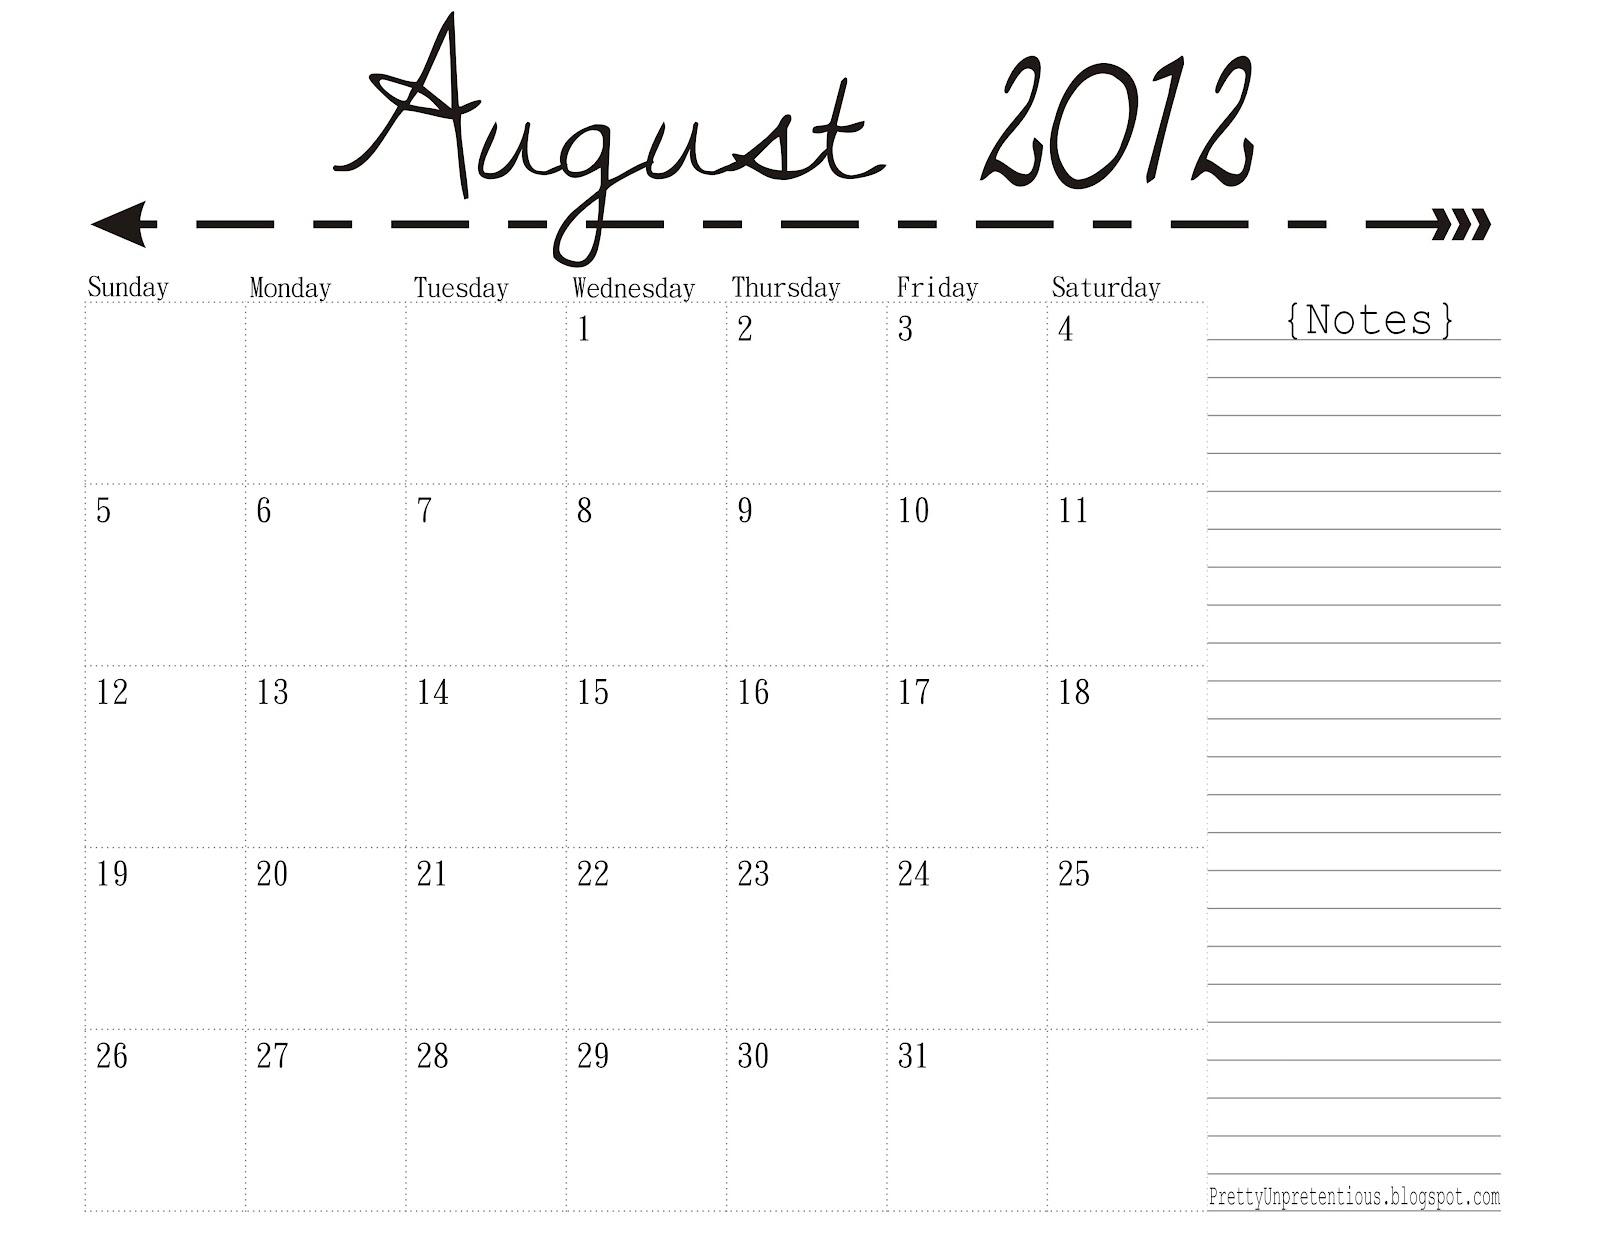 August 2014 Calendar Printable